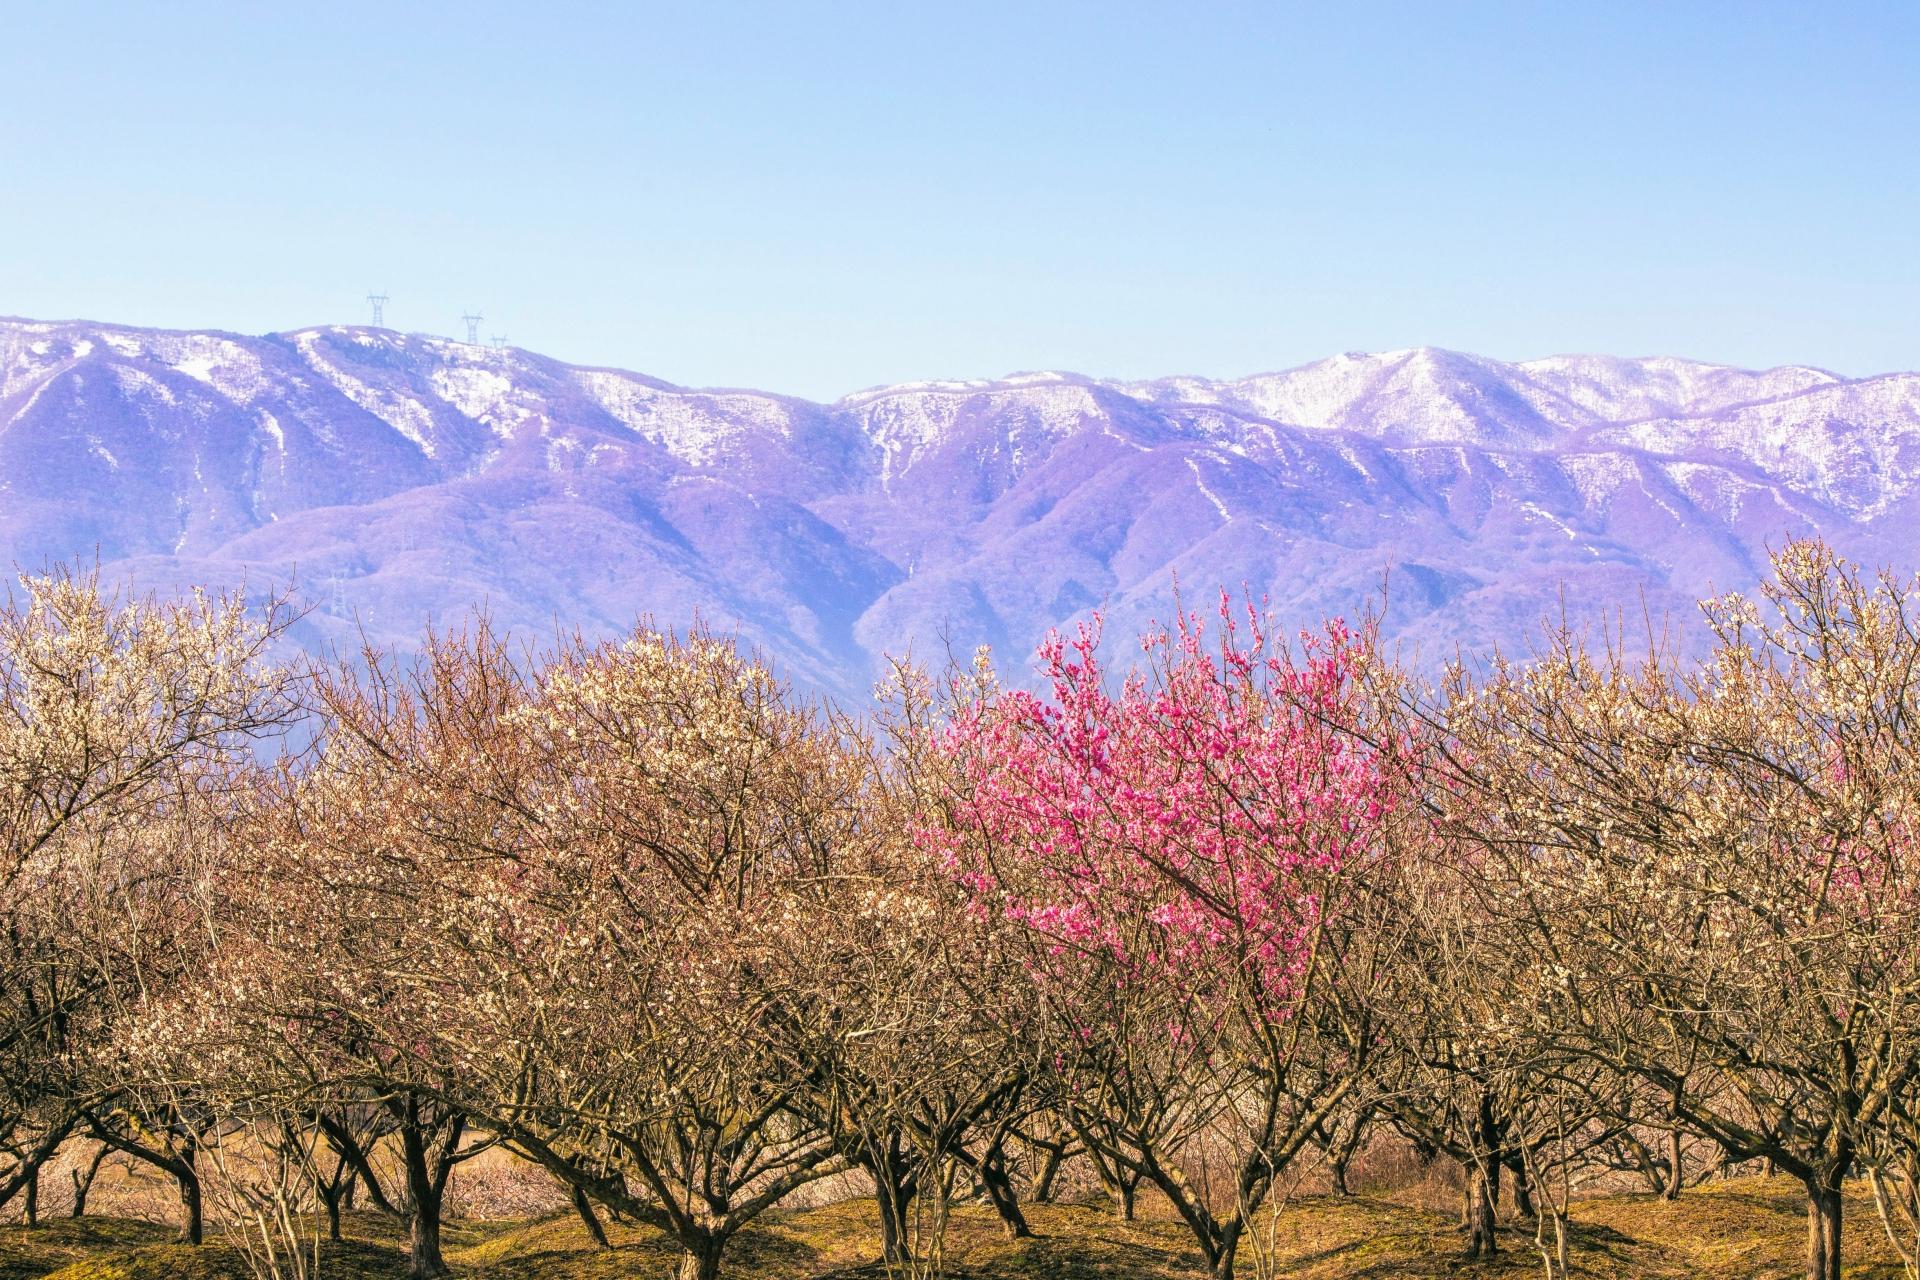 2338374_m 三重県 いなべ市農業公園 梅林園(まるで桃源郷のような景色が見れる絶景の梅林写真スポット。 写真の紹介、アクセス情報や交通手段・駐車場情報などまとめ)